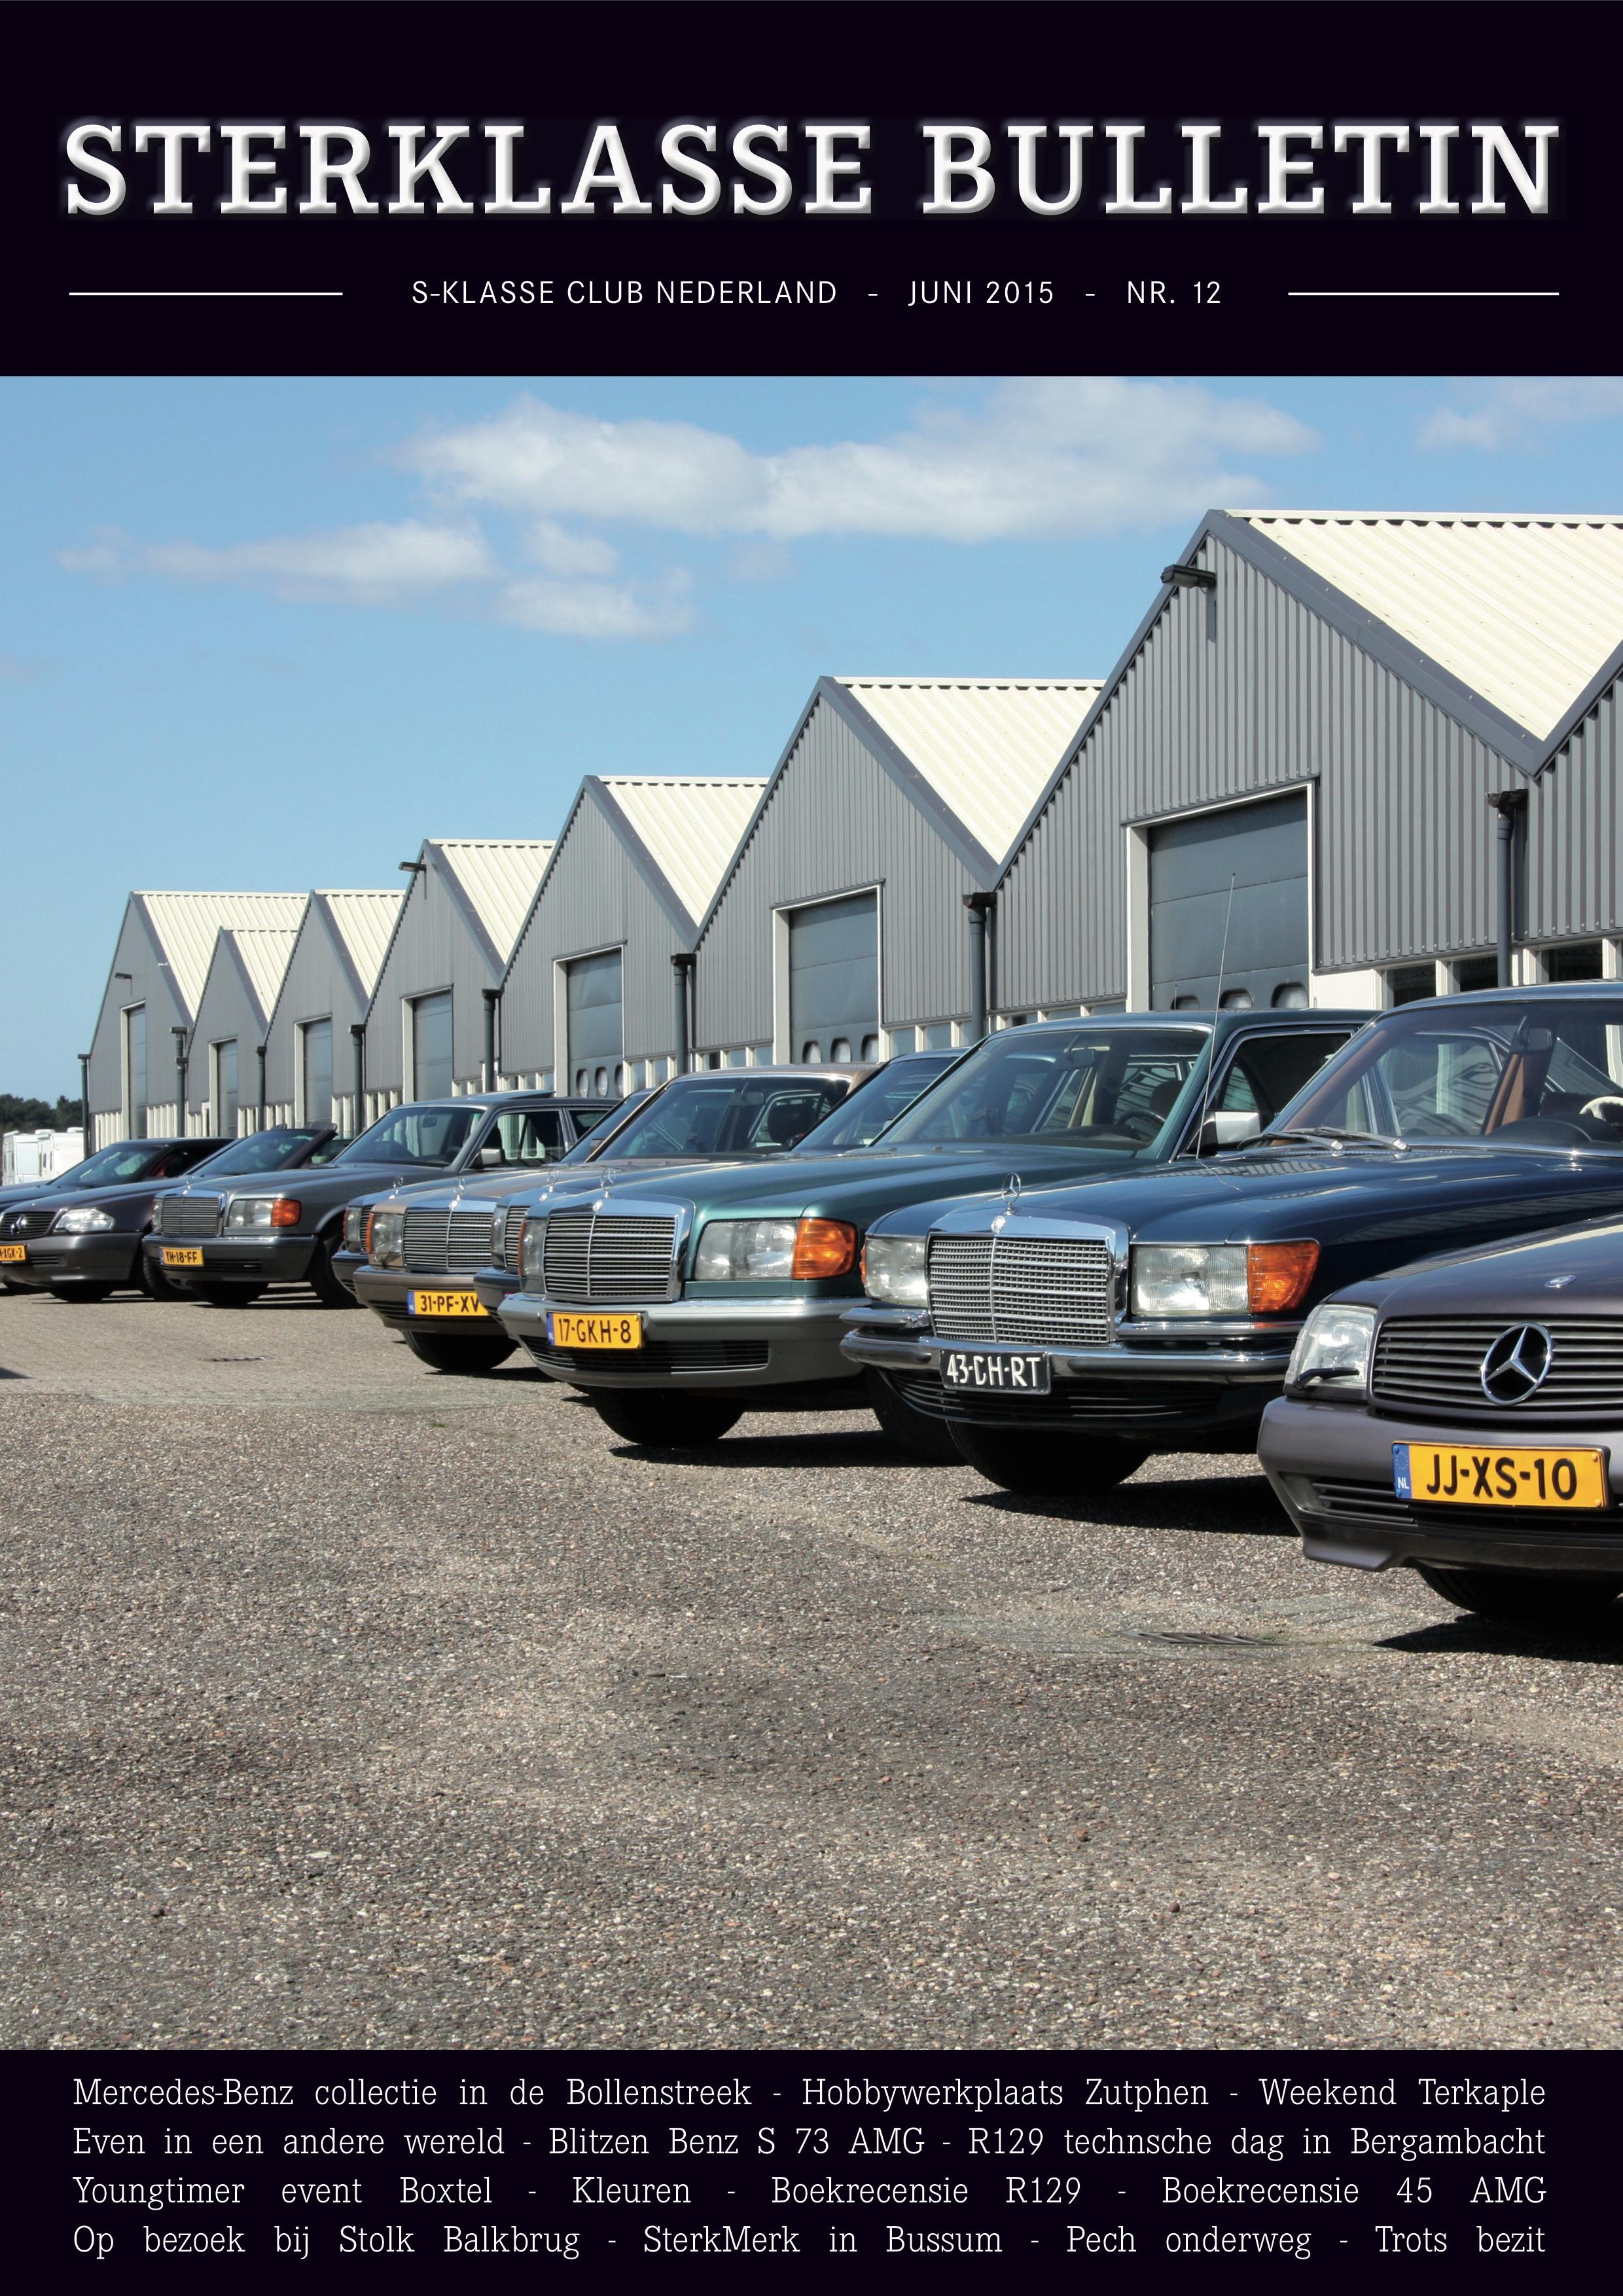 Sterklasse Bulletin 12 SKCN Mercedes-Benz-S-Klasse Club Nederland